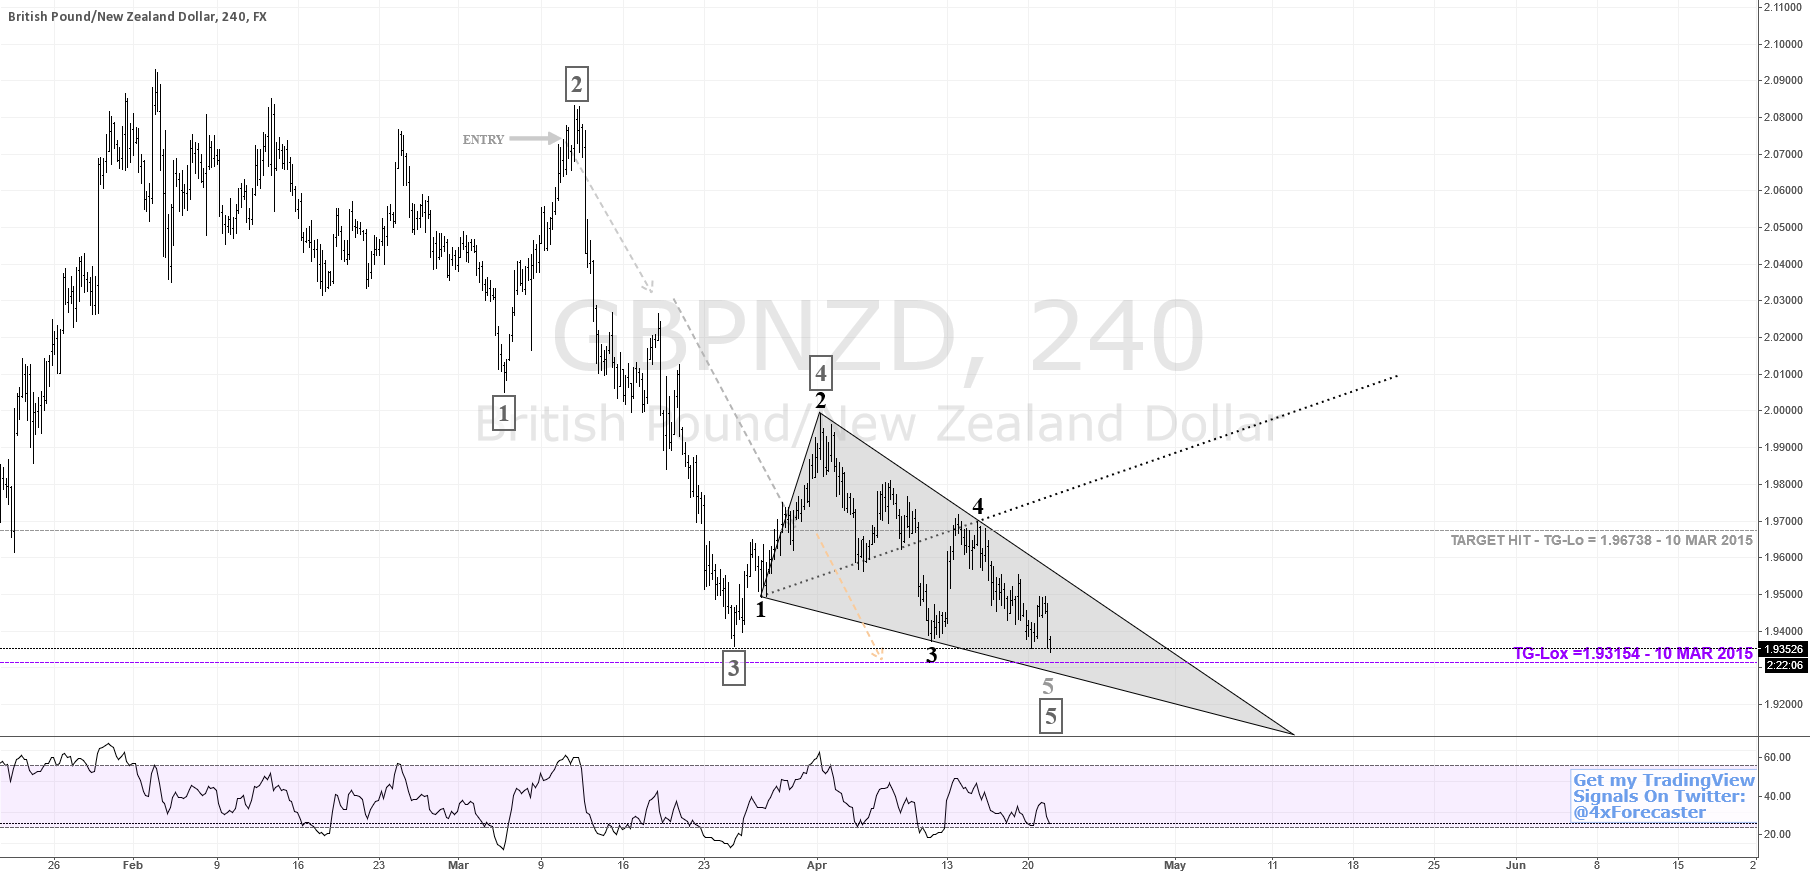 $GBP vs. $NZD Nears Bearish Target at 1.93154 \ $USD #forex #BOE